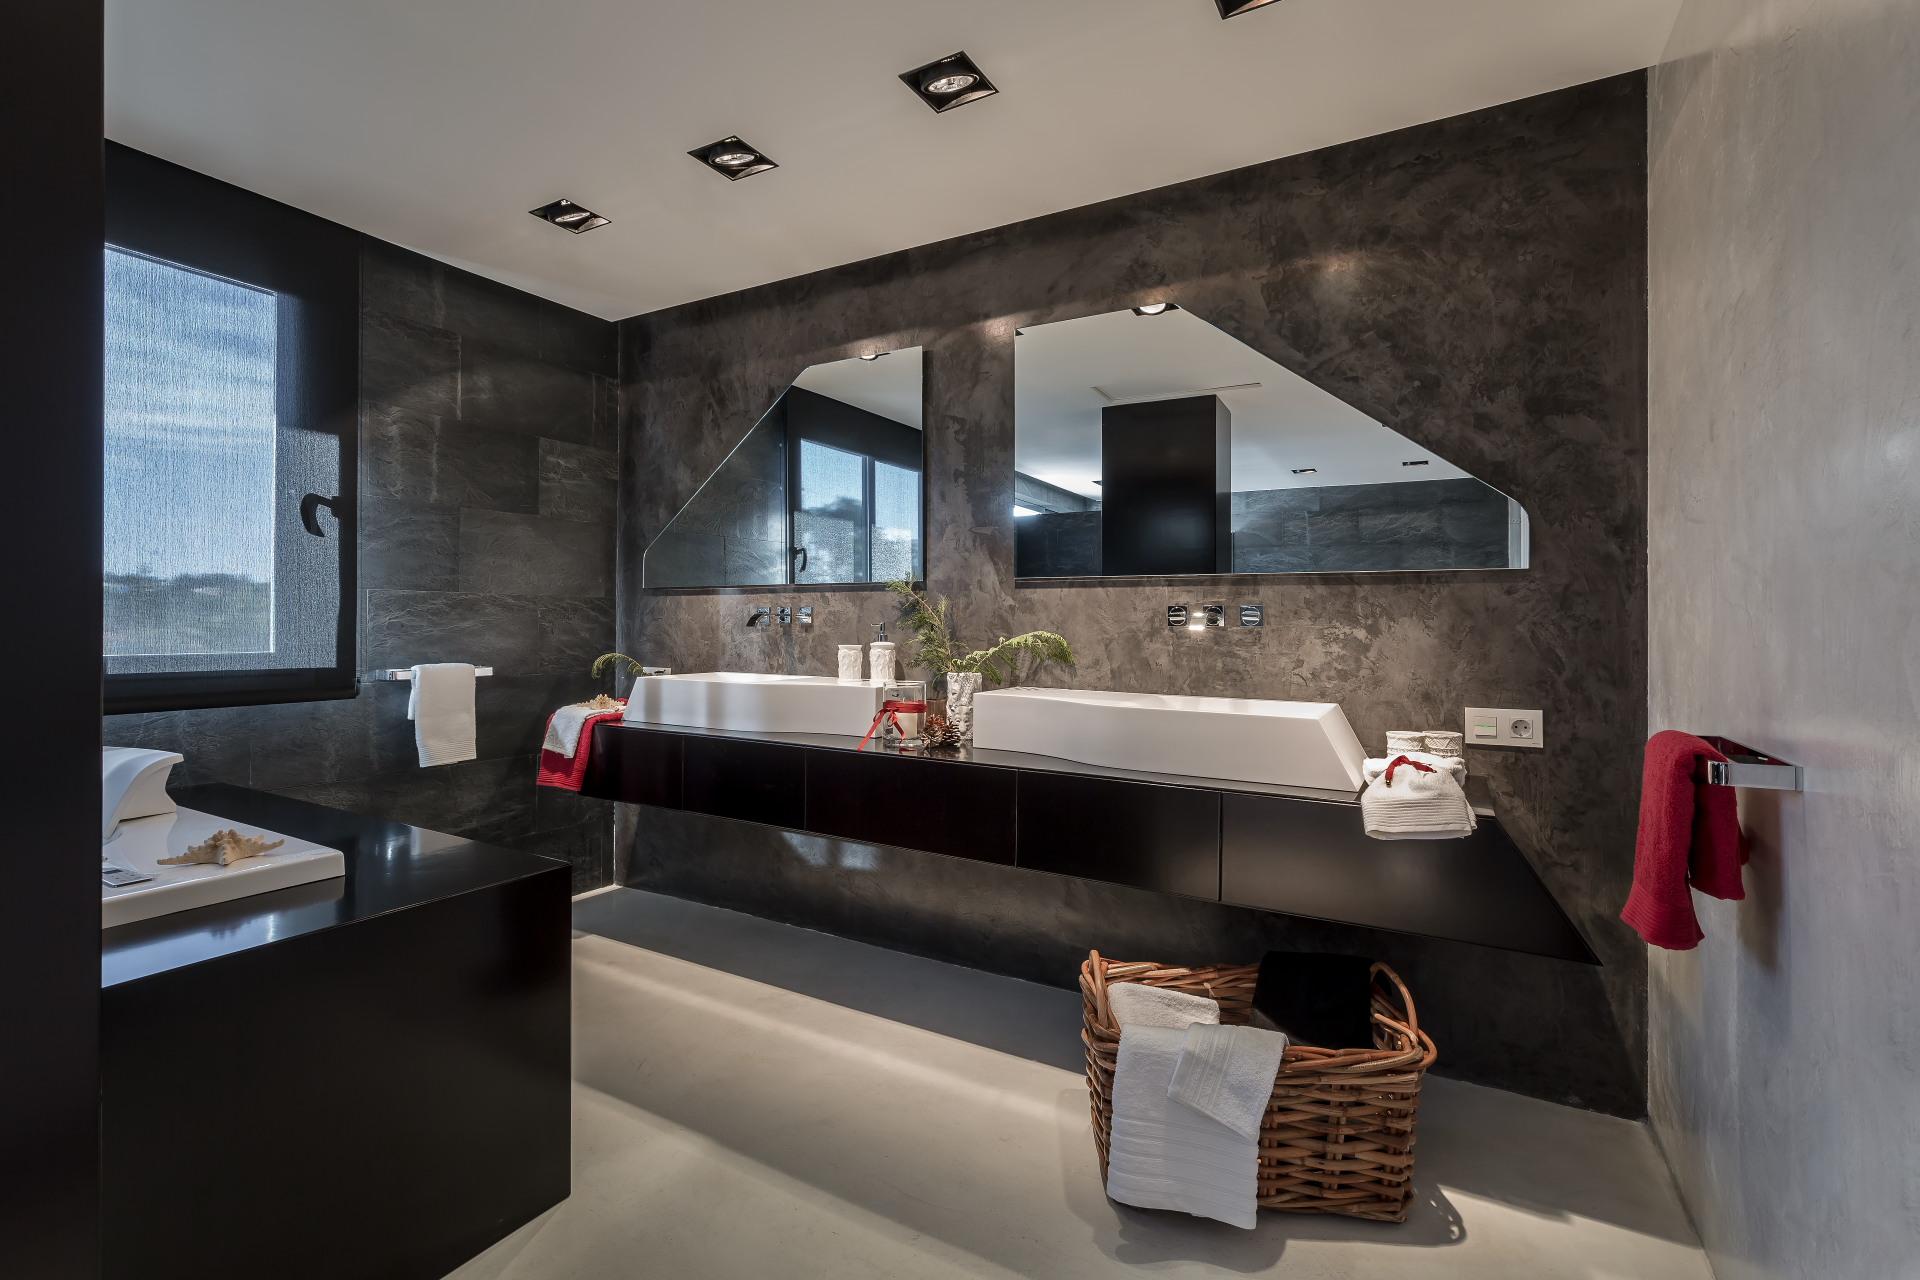 fotografia-arquitectura-valencia-german-cabo-laura_yerpes_canyada (22)